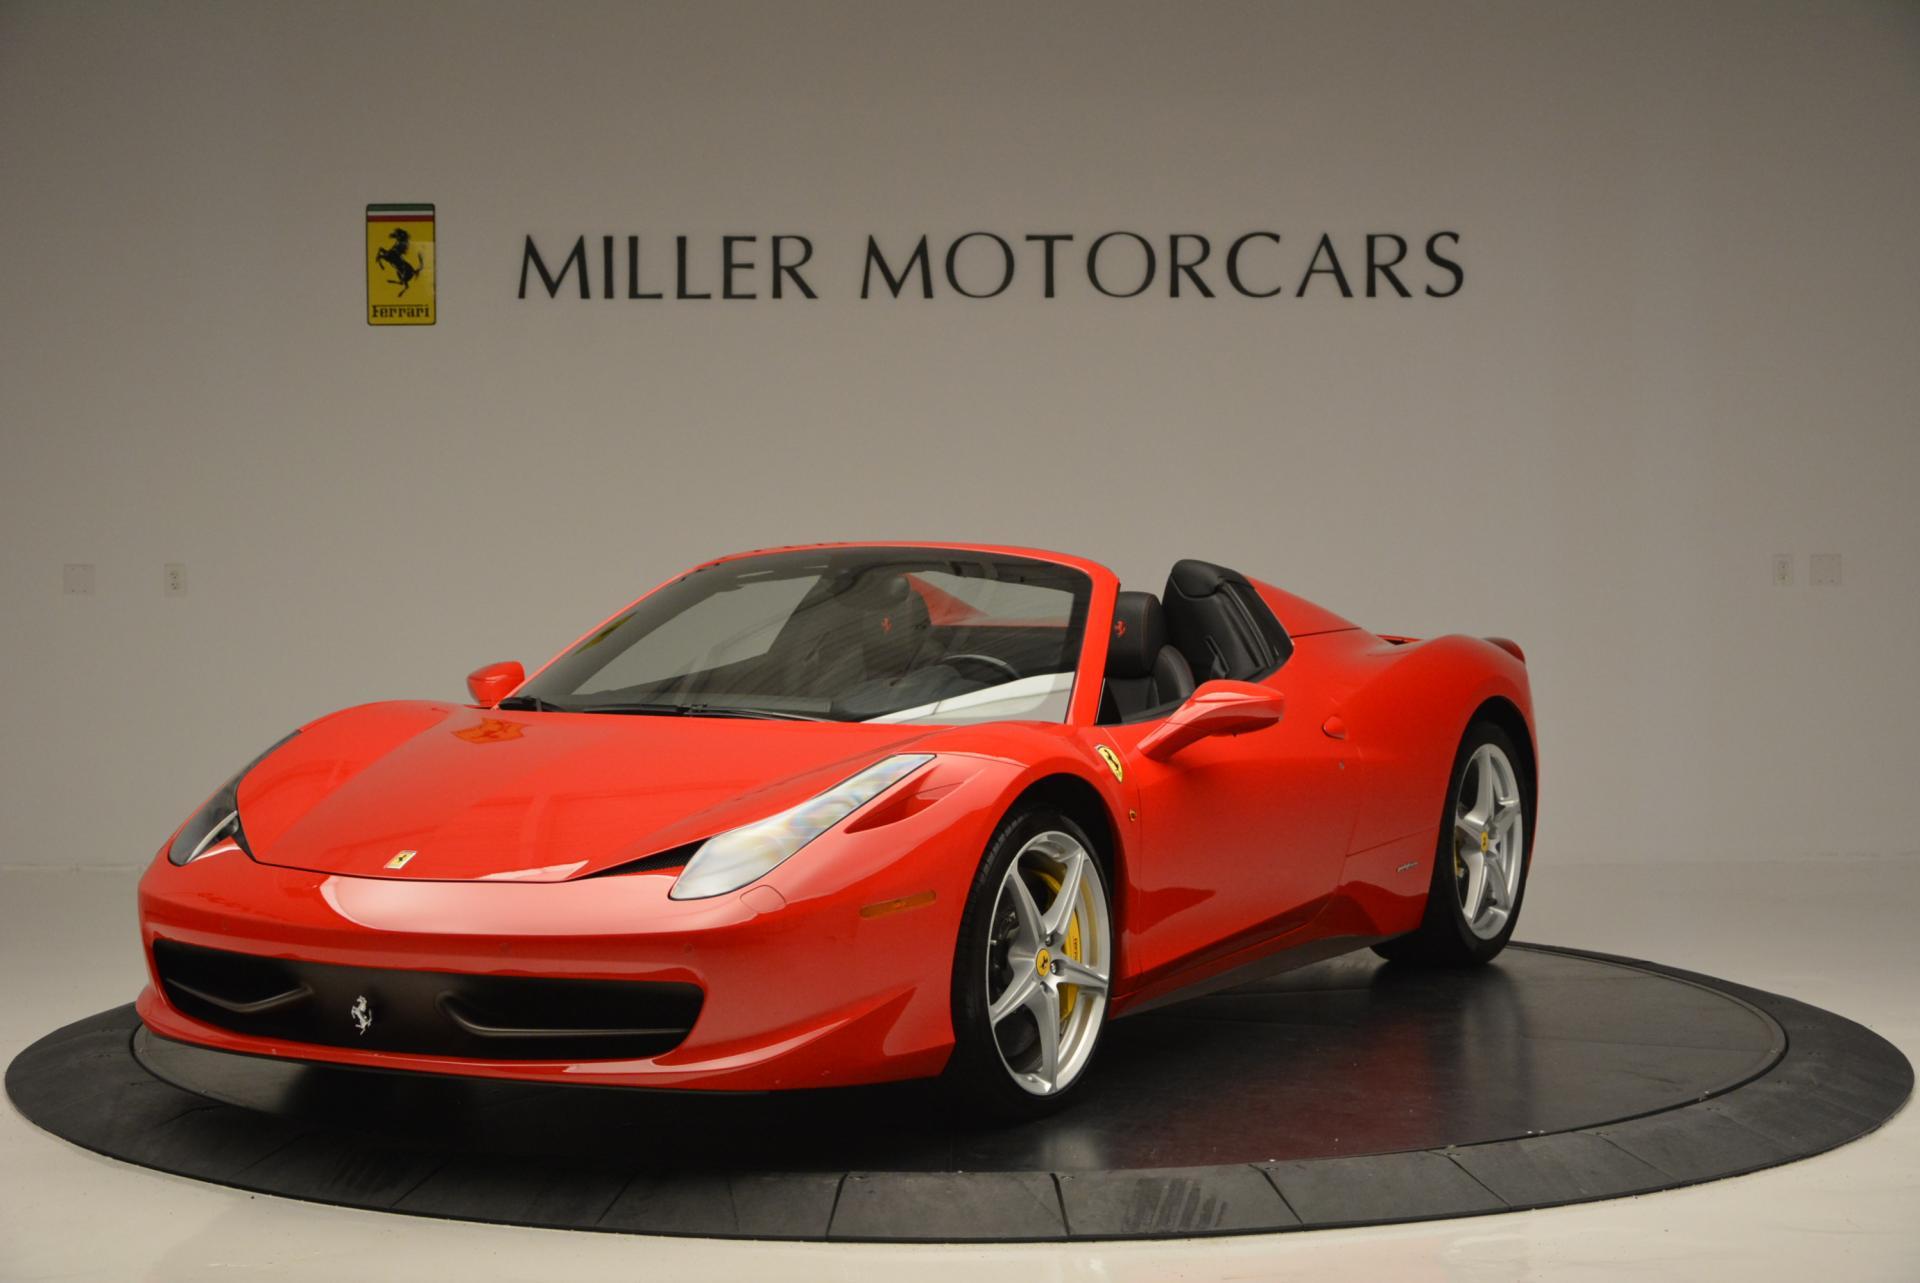 Used 2014 Ferrari 458 Spider for sale Sold at Alfa Romeo of Westport in Westport CT 06880 1